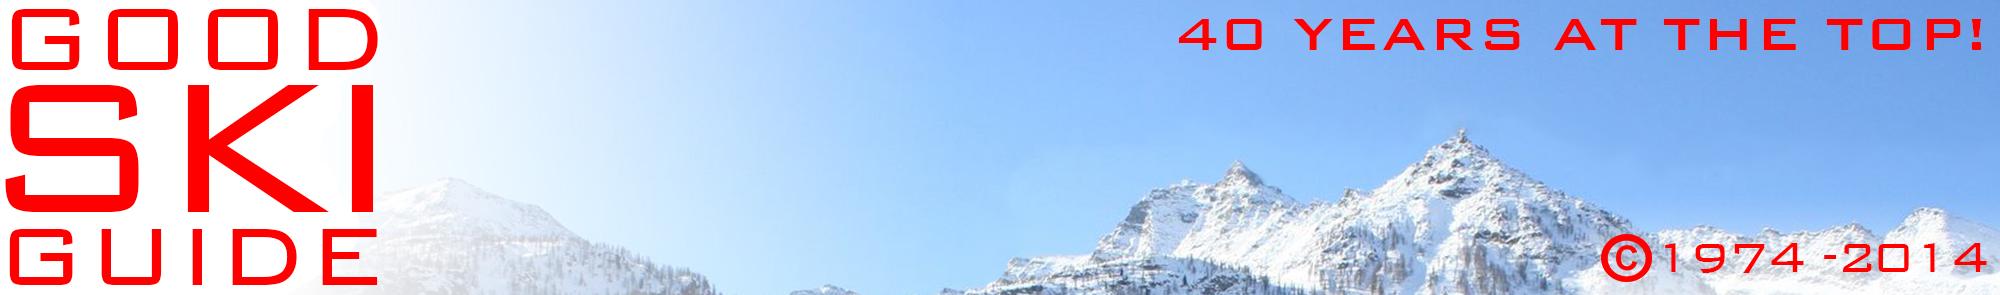 Good Ski Guide